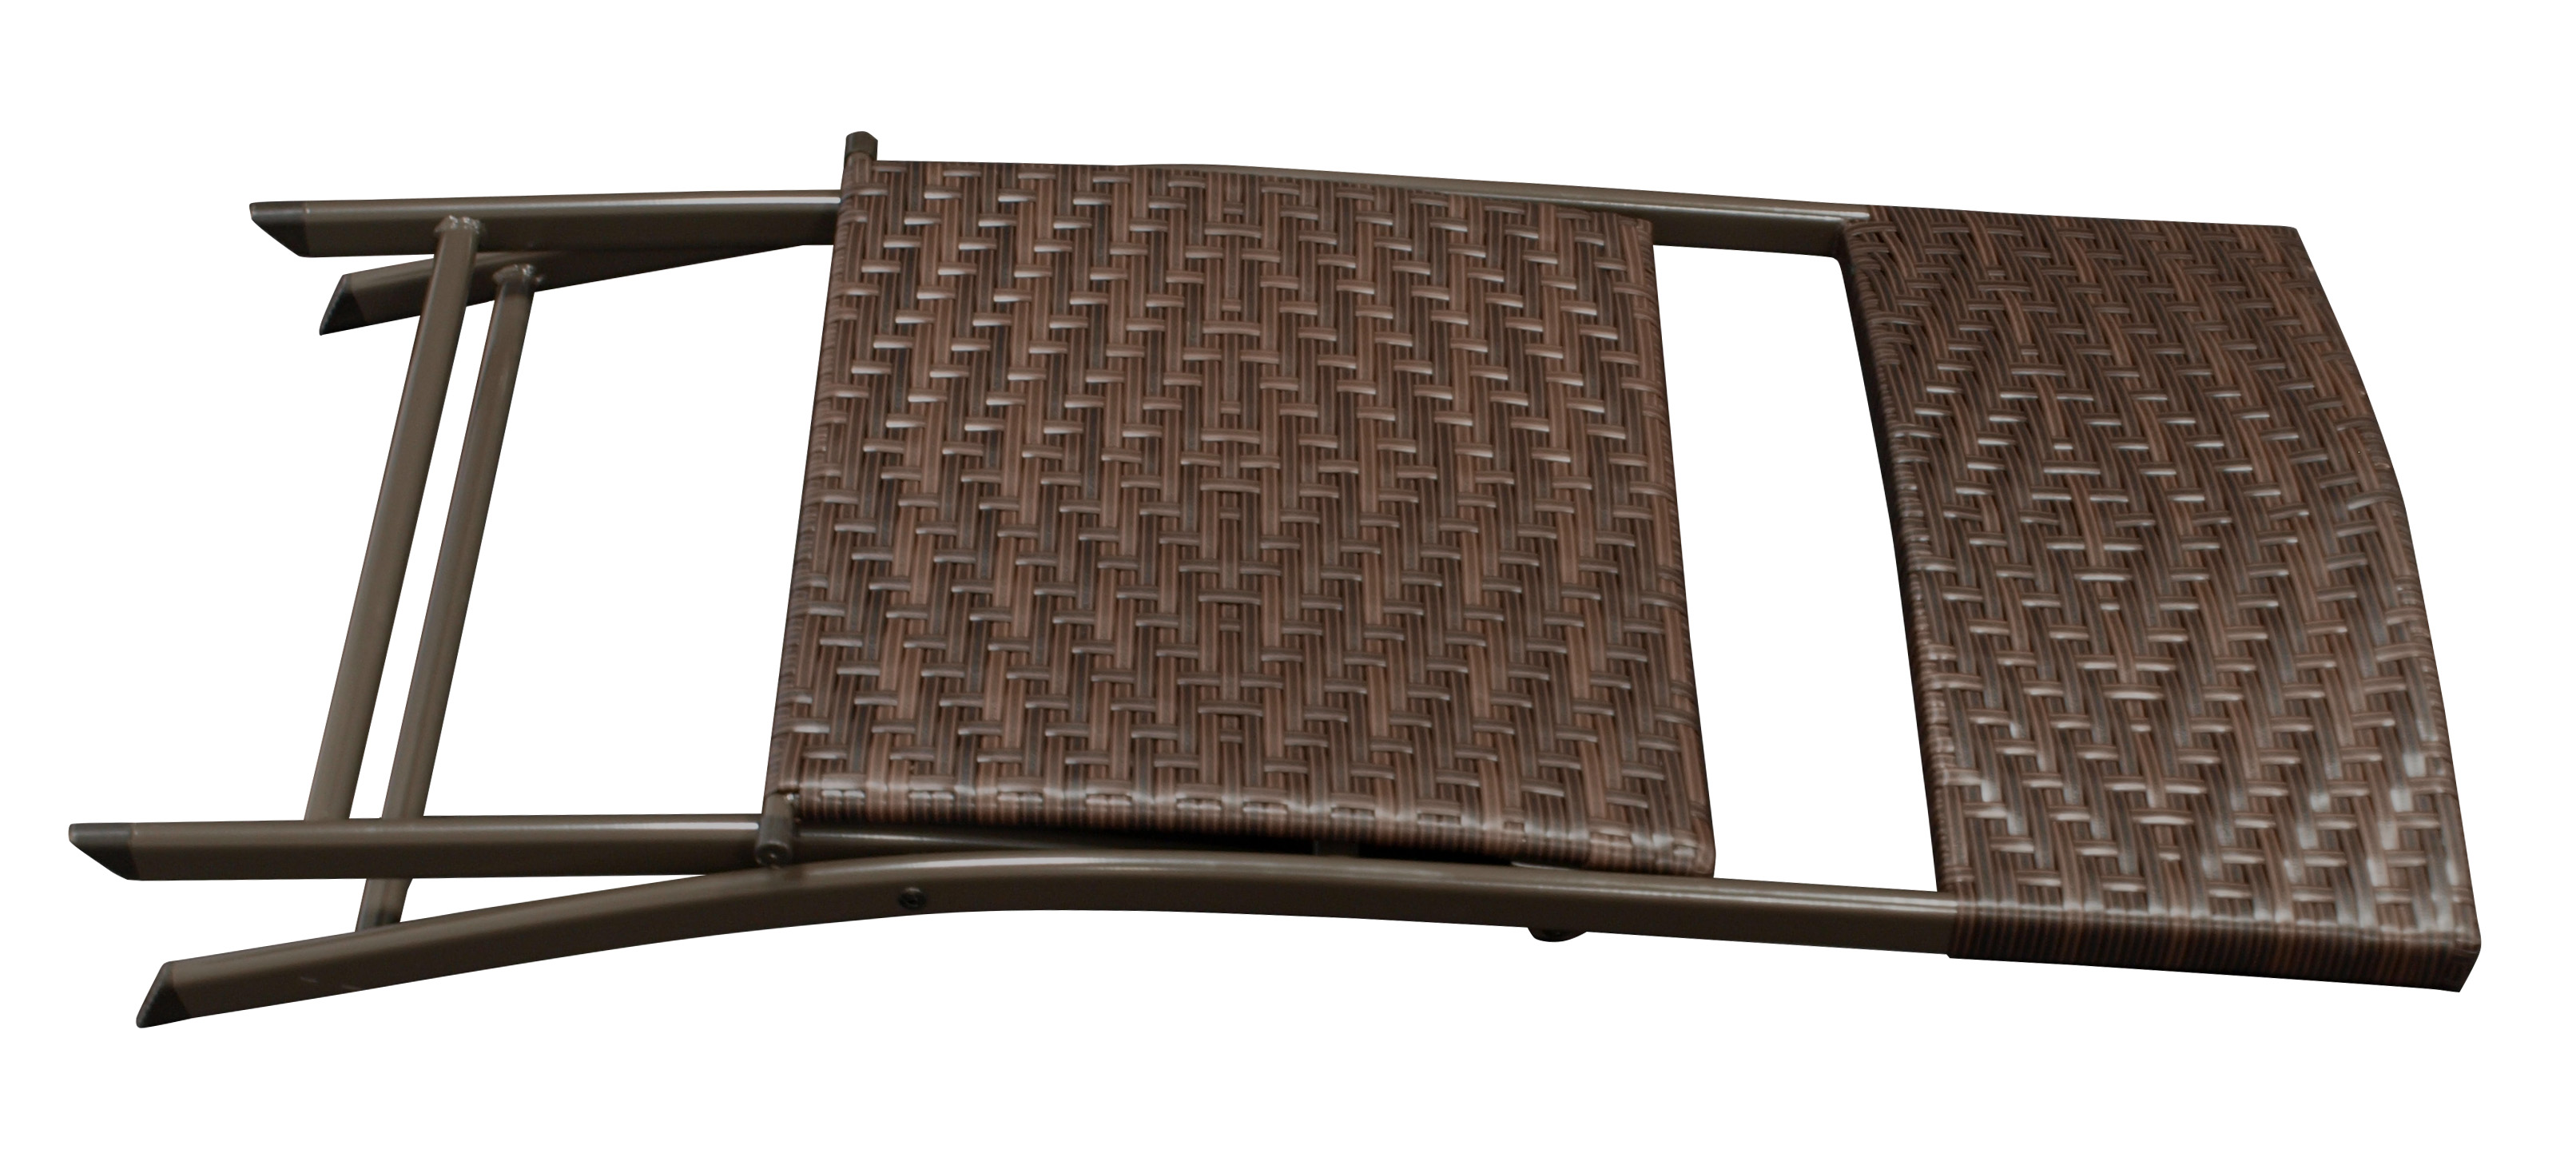 Bistroset ROSSANO 3-teilig klappbar, Metall + Polyrattan braun bicolor